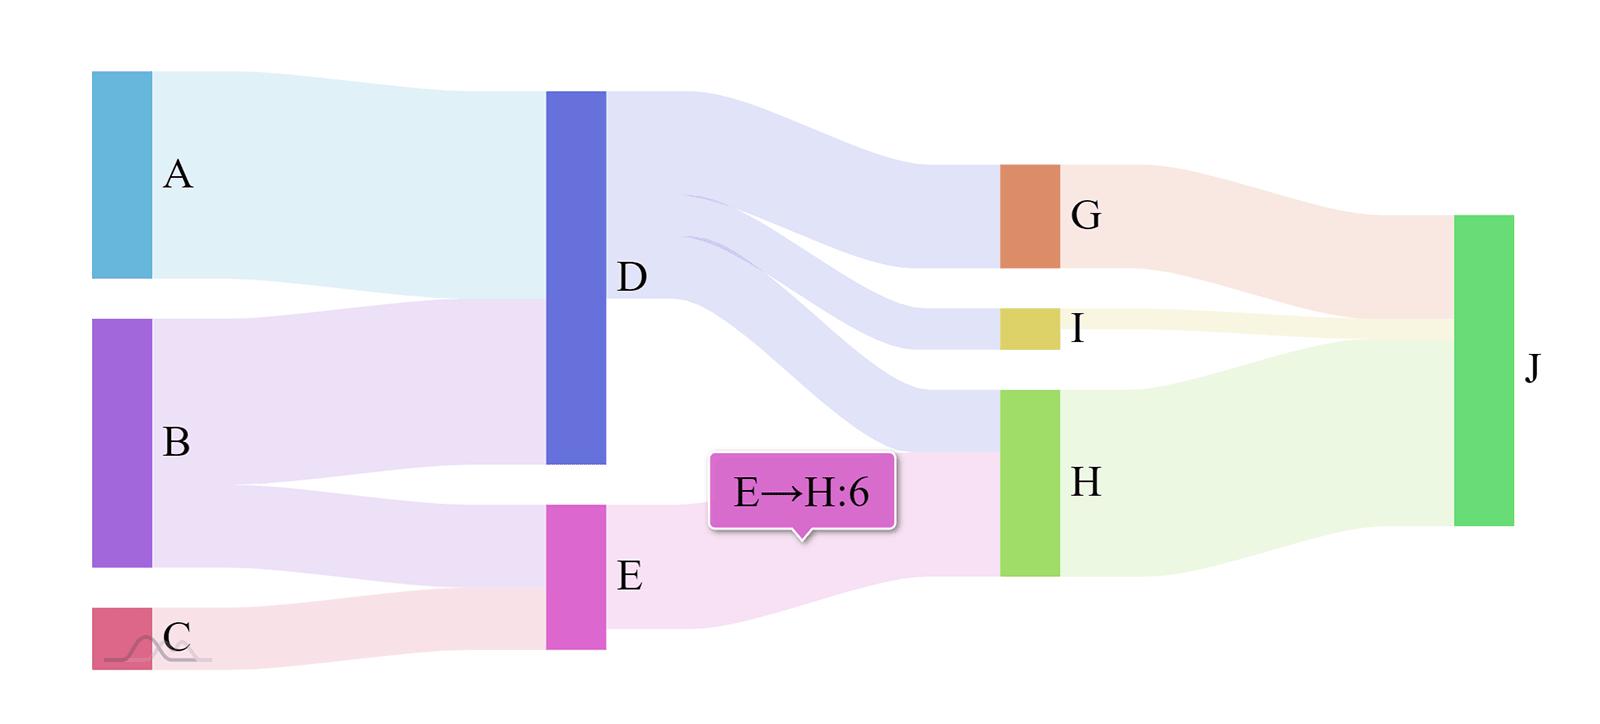 hight resolution of sankey diagram